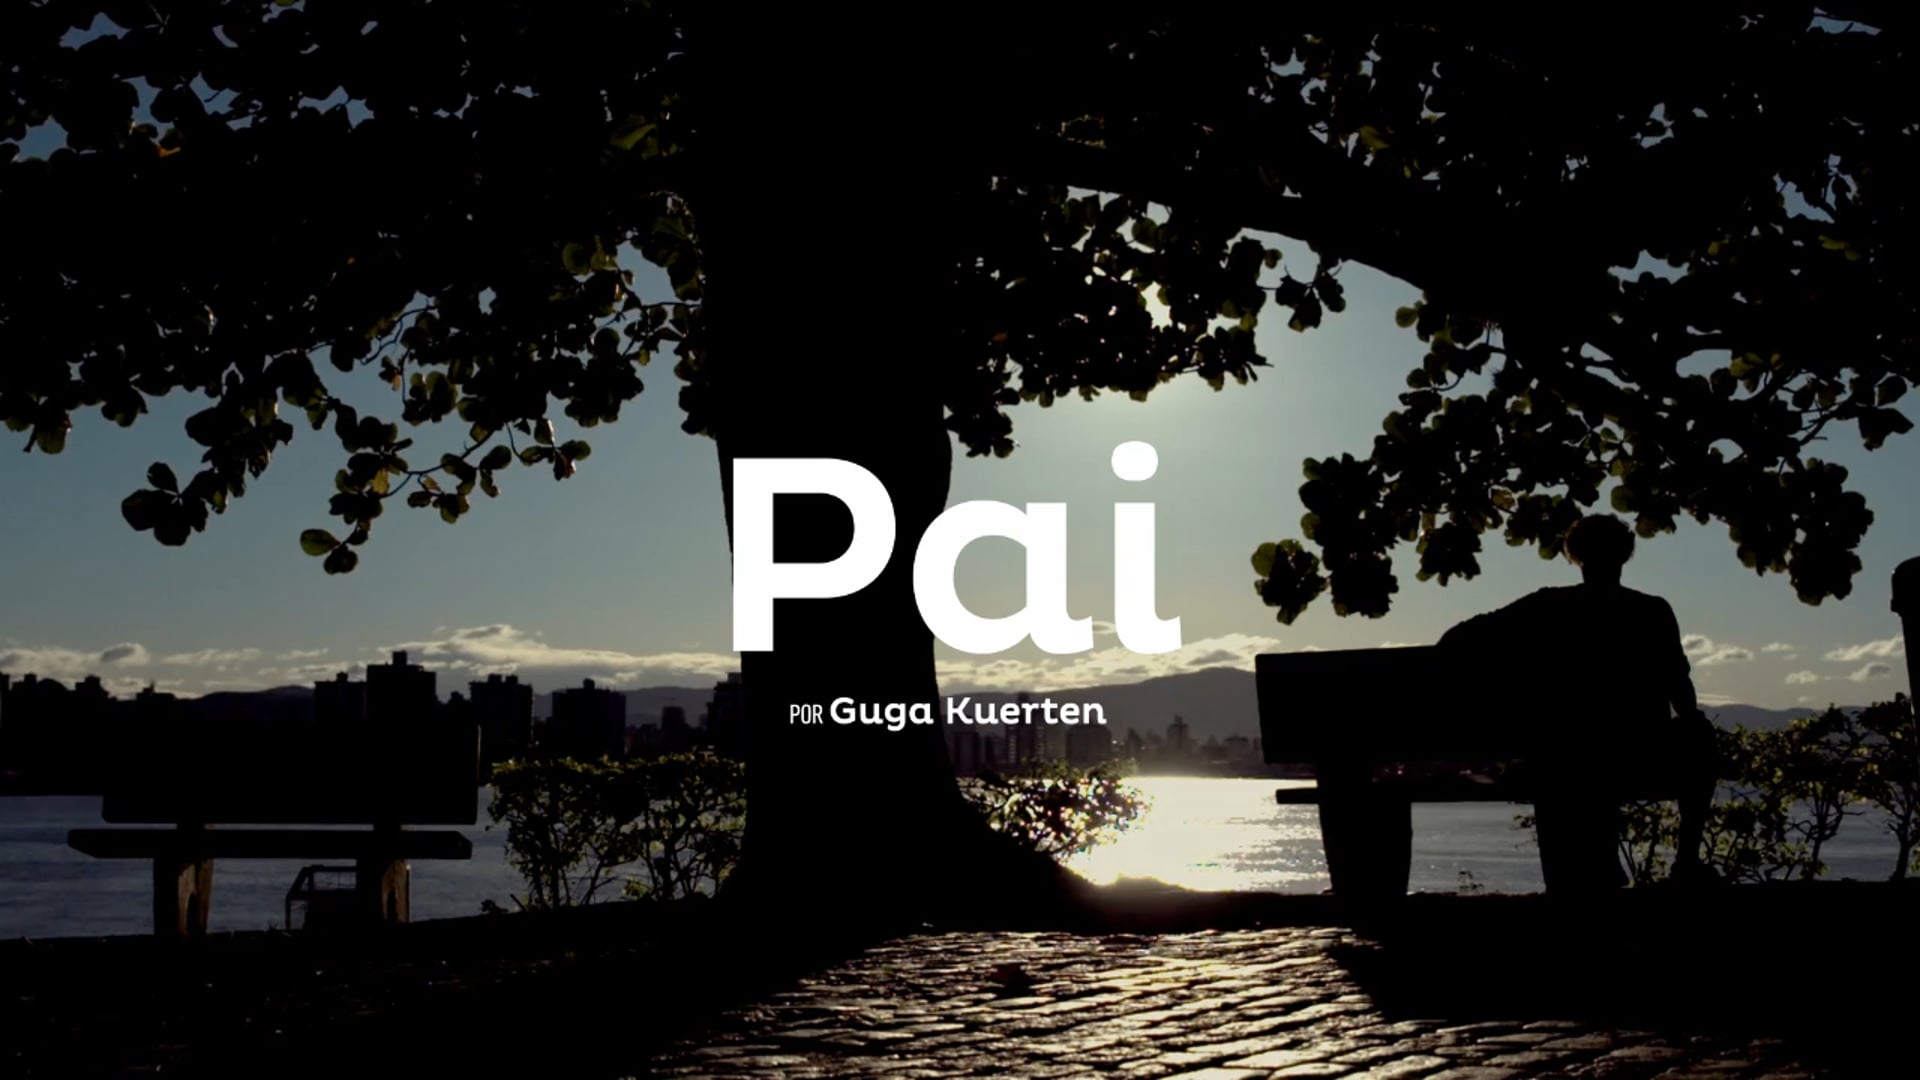 PAI, por Guga Kuerten - (redux 3  créditos)